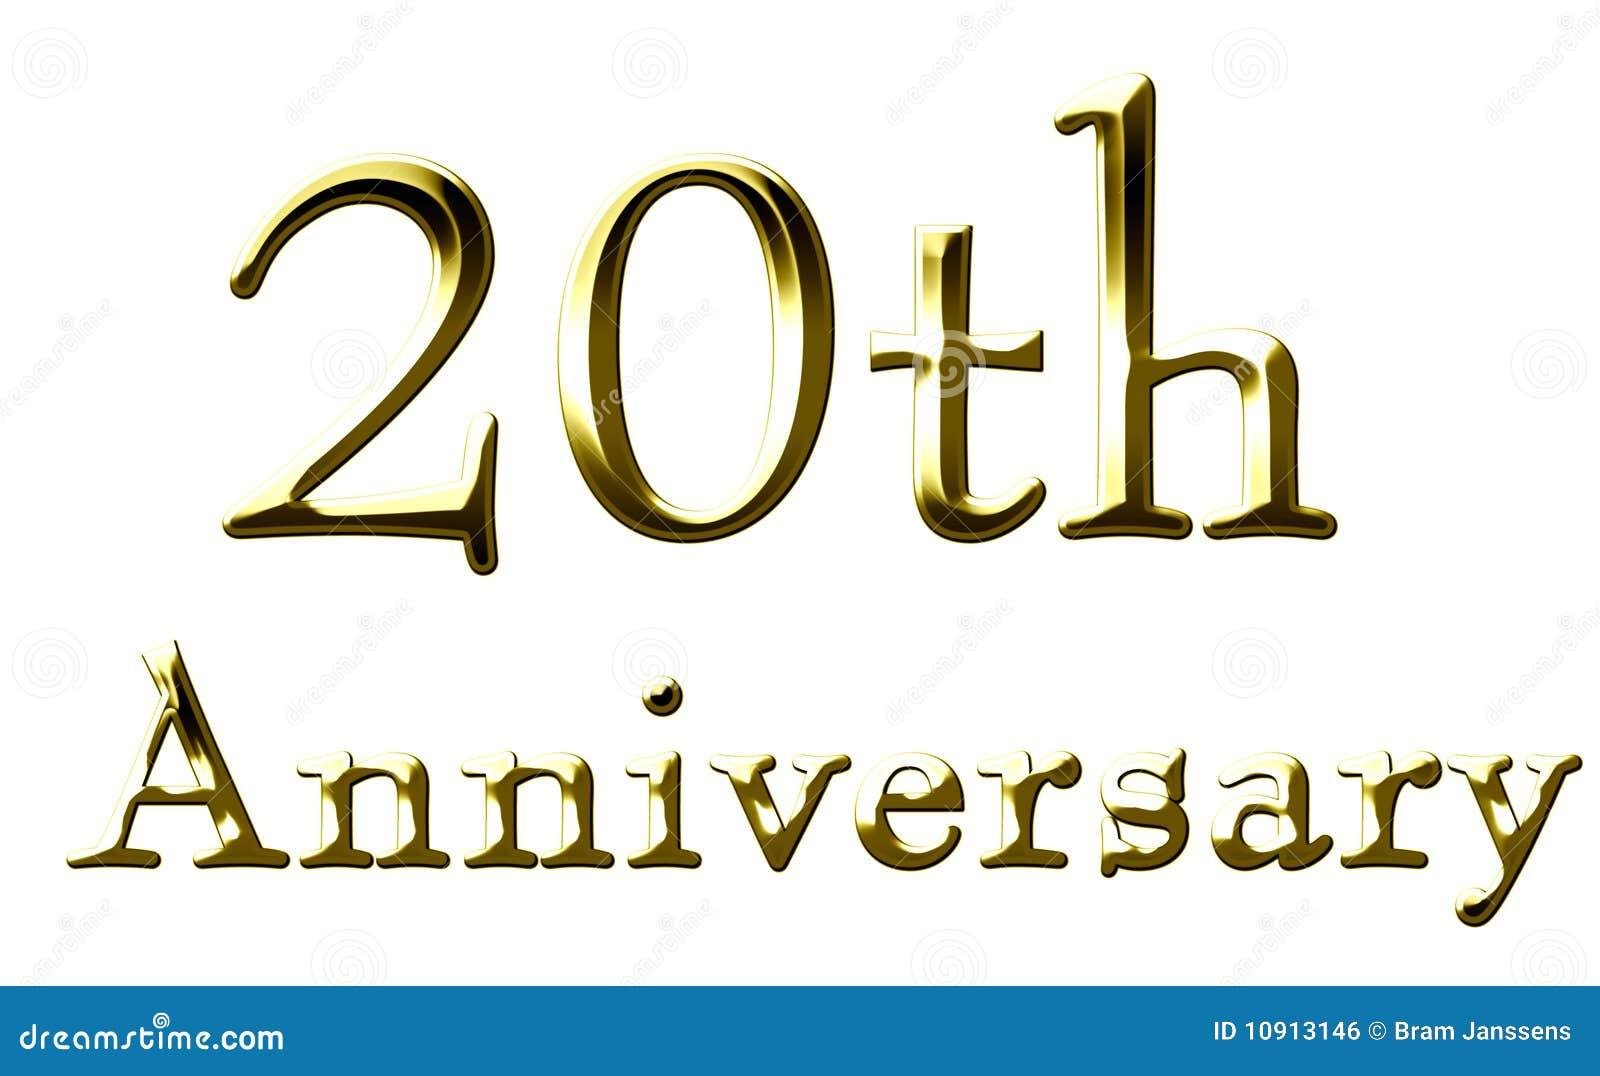 Th anniversary royalty free stock image